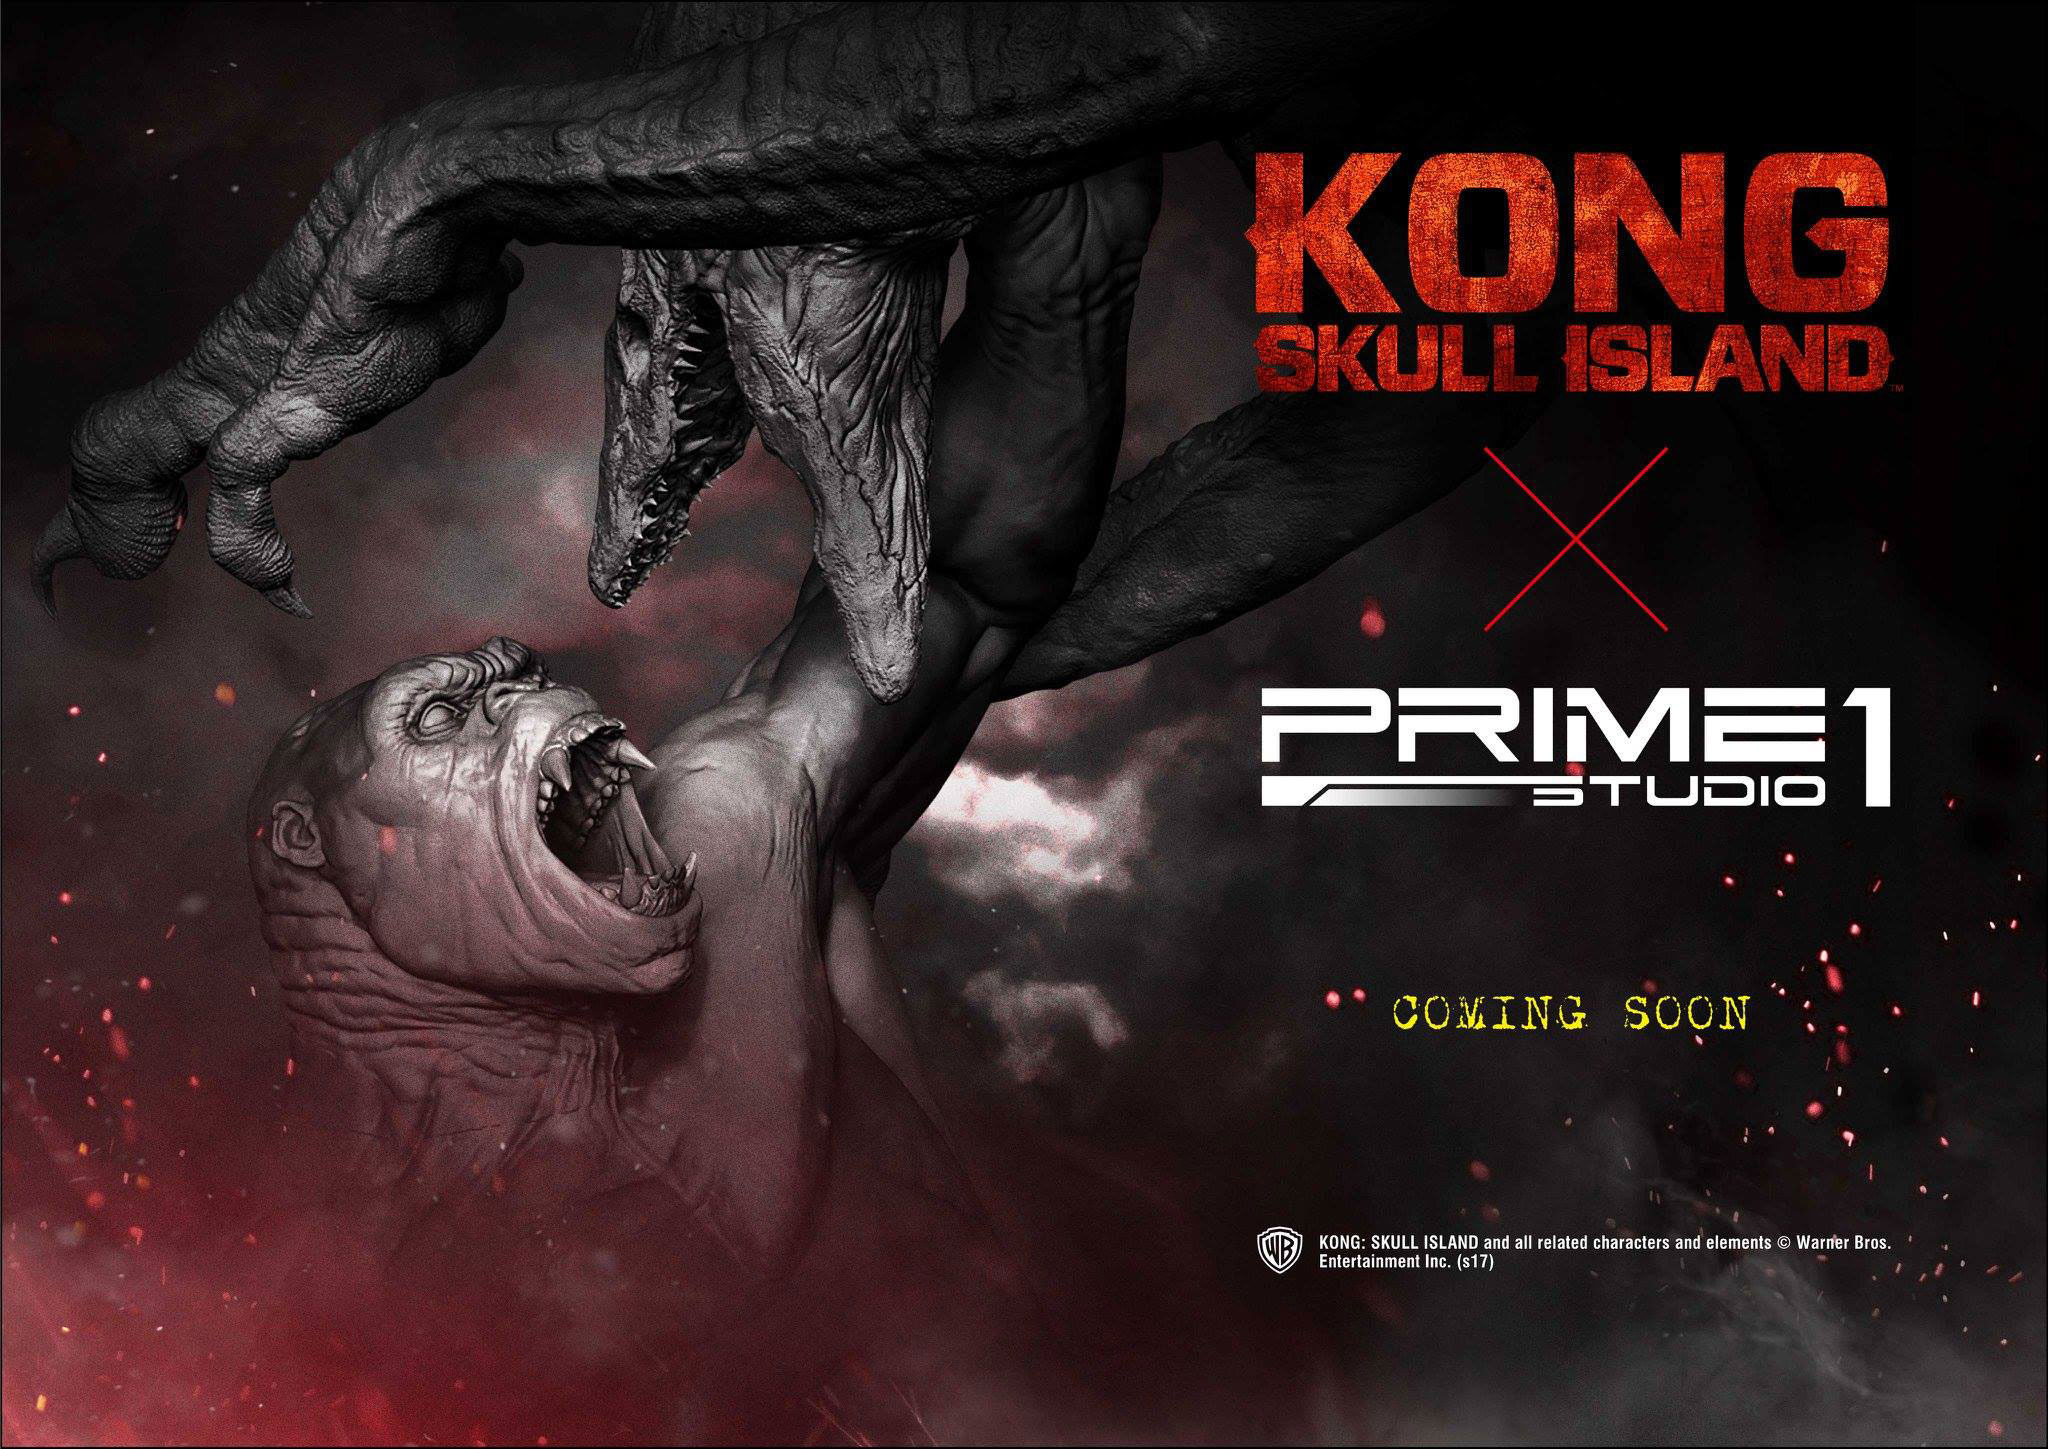 kong-skull-island-prime-1-studio-statue-preview